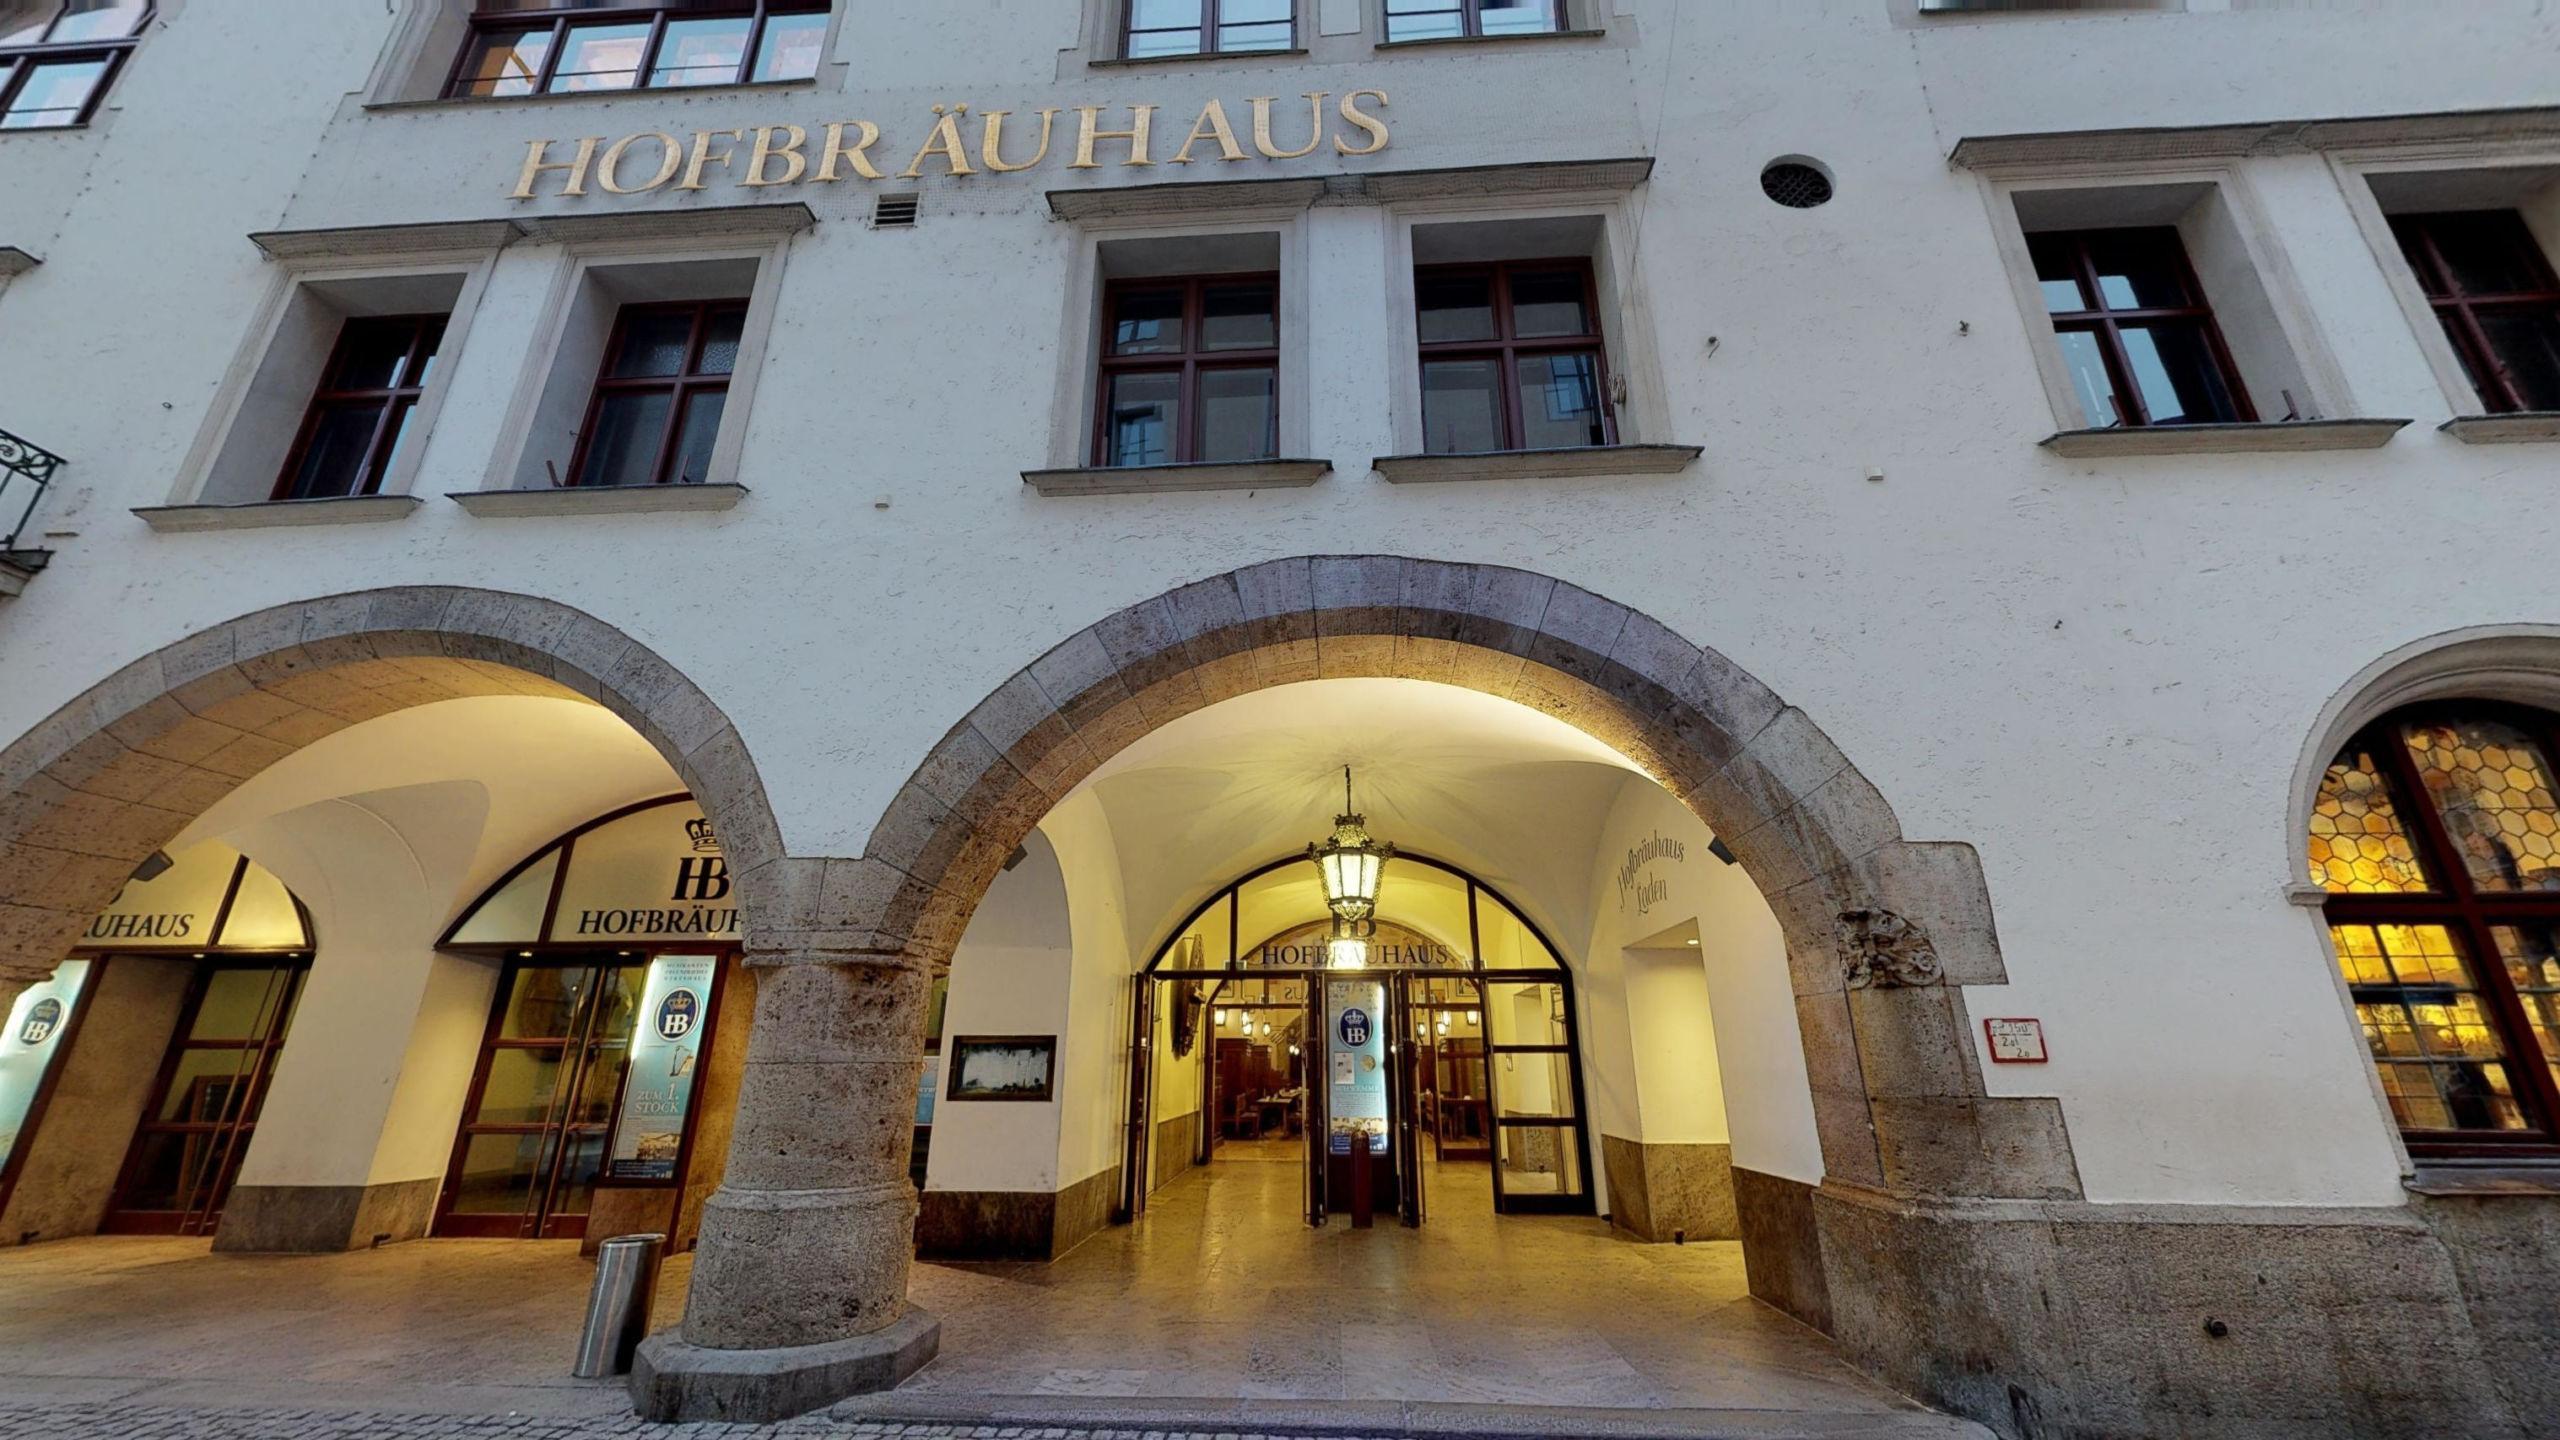 HOFBRÄUHAUS MUNICH ENTRANCE | GOOGLE STREET VIEW | VIRTUAL TOUR